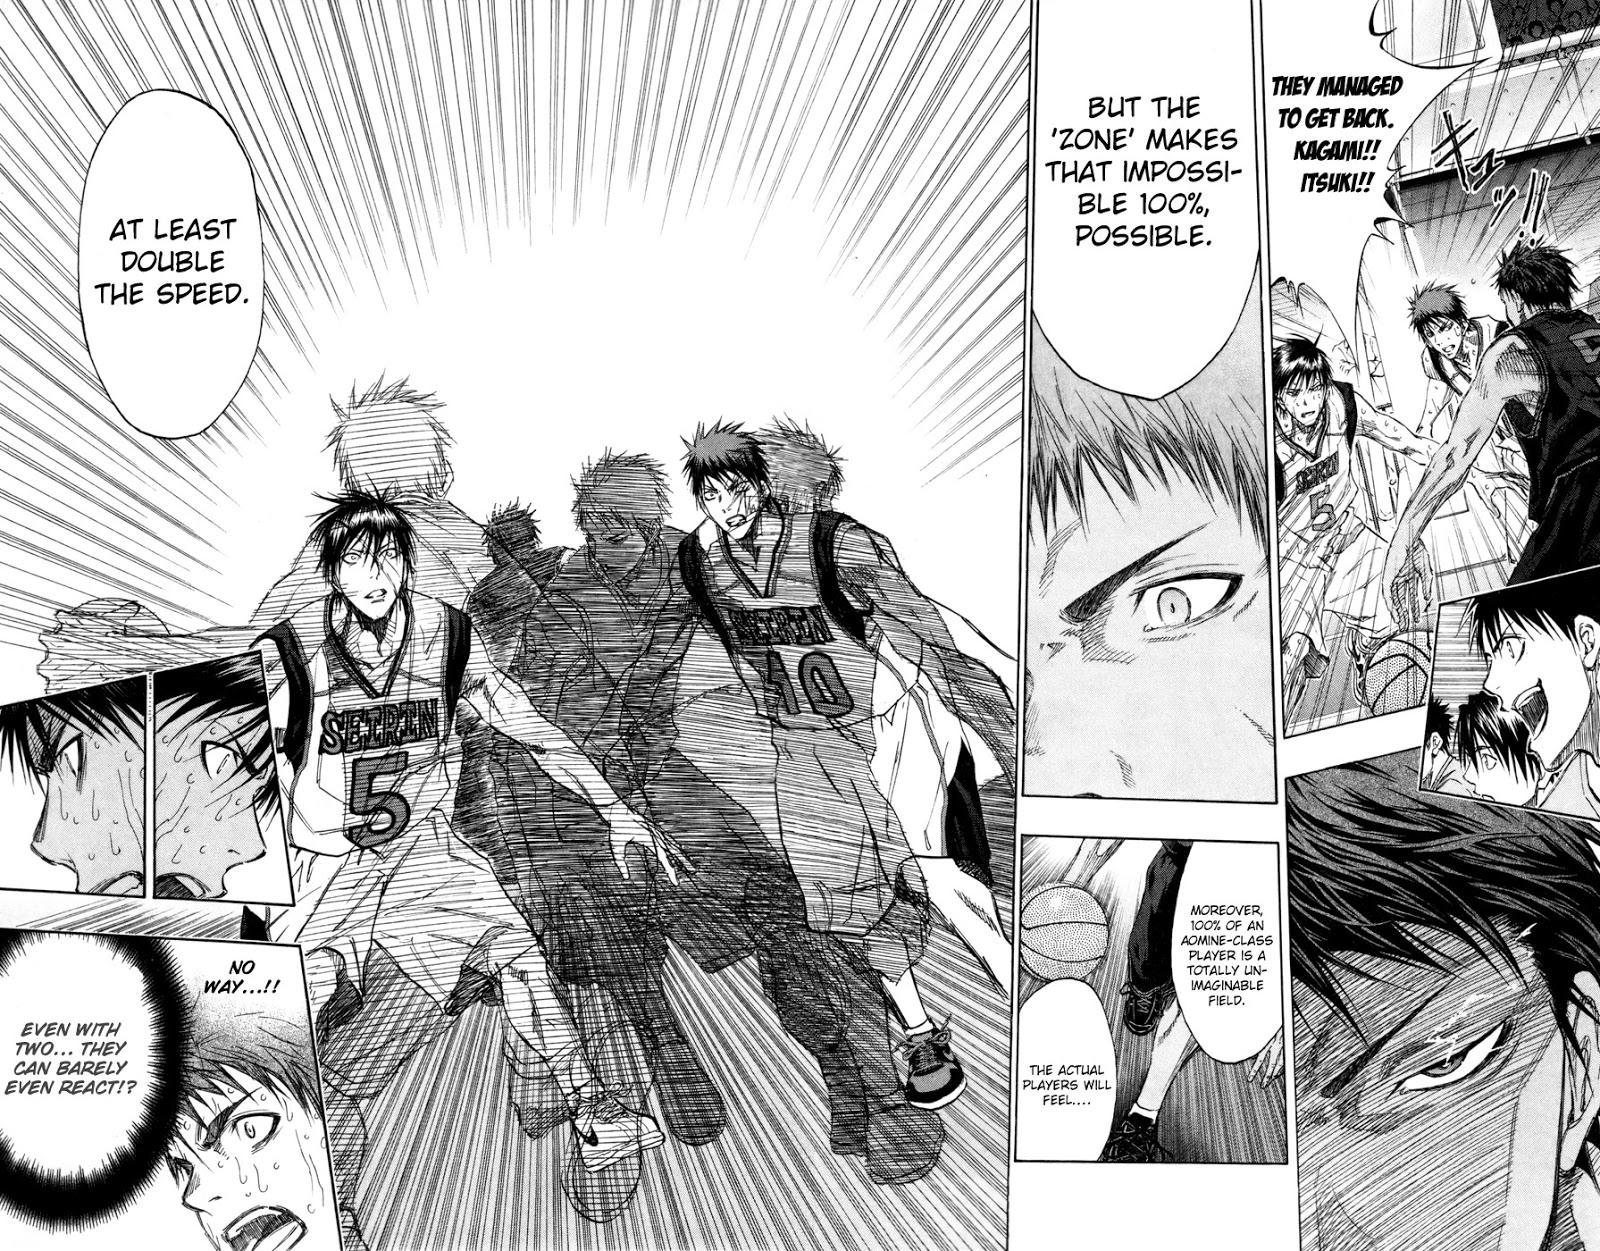 Kuroko no Basket Manga Chapter 134 - Image 02-03